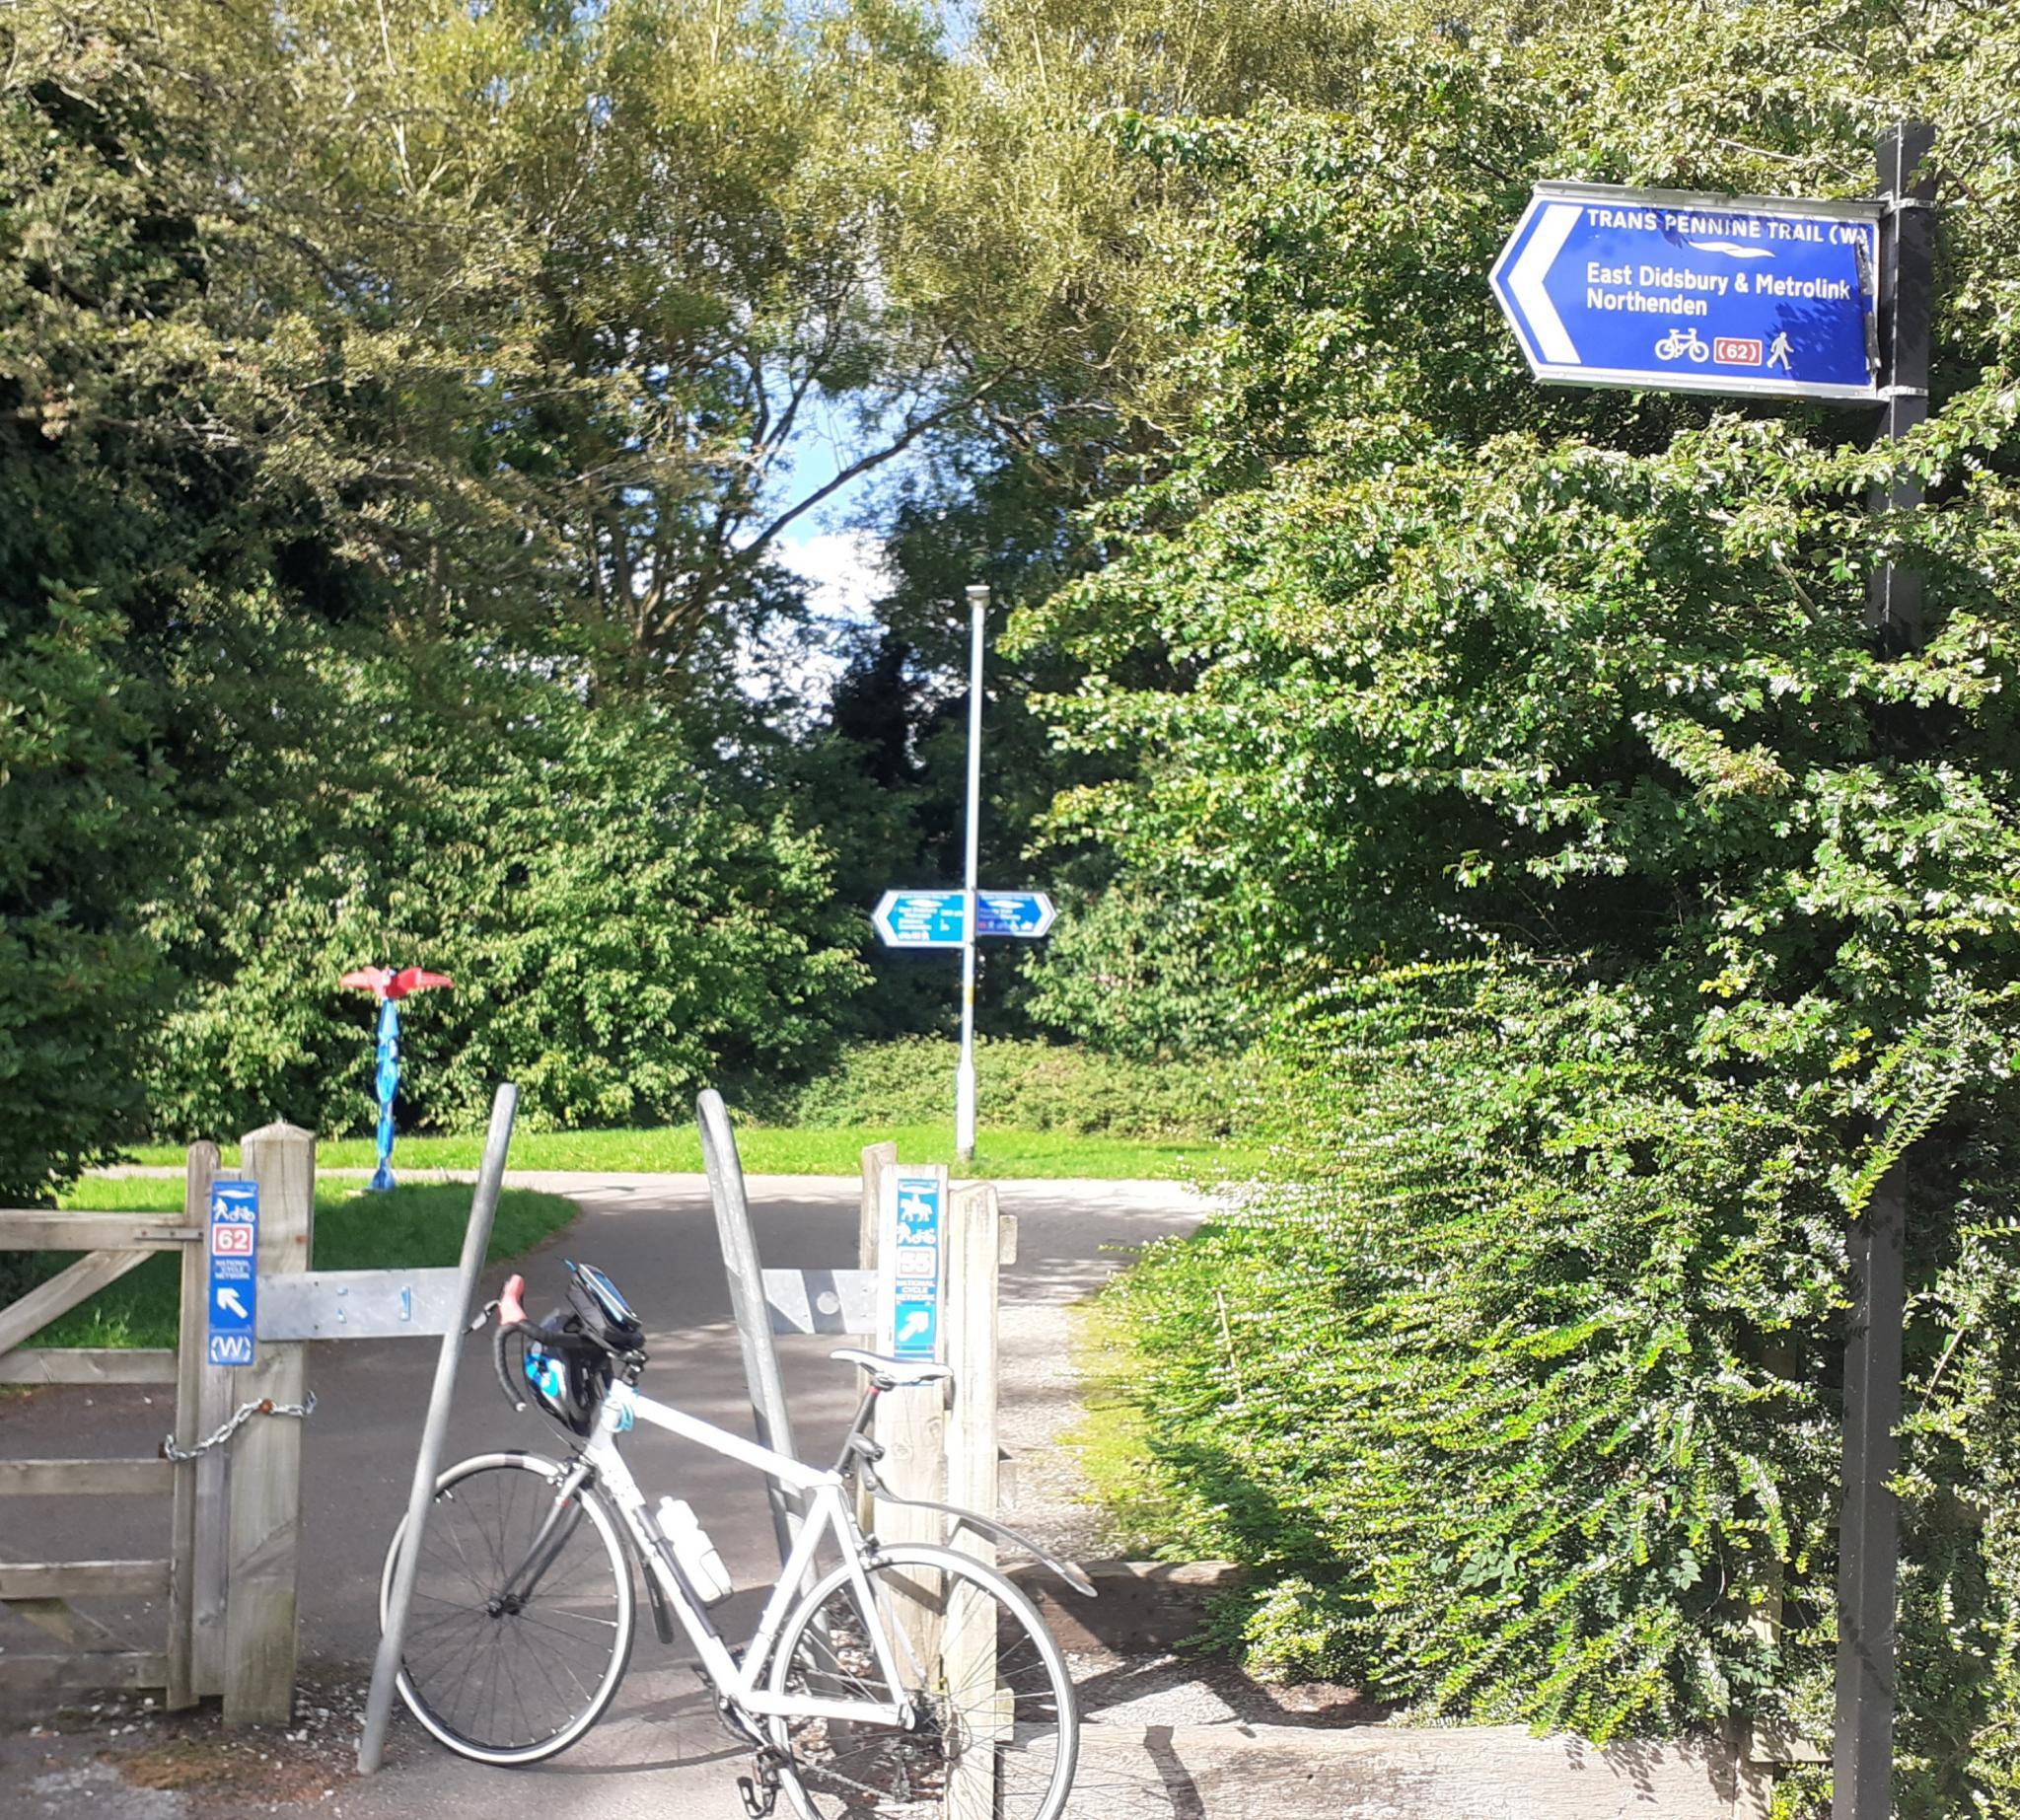 On my bike-20200803_200949-jpg